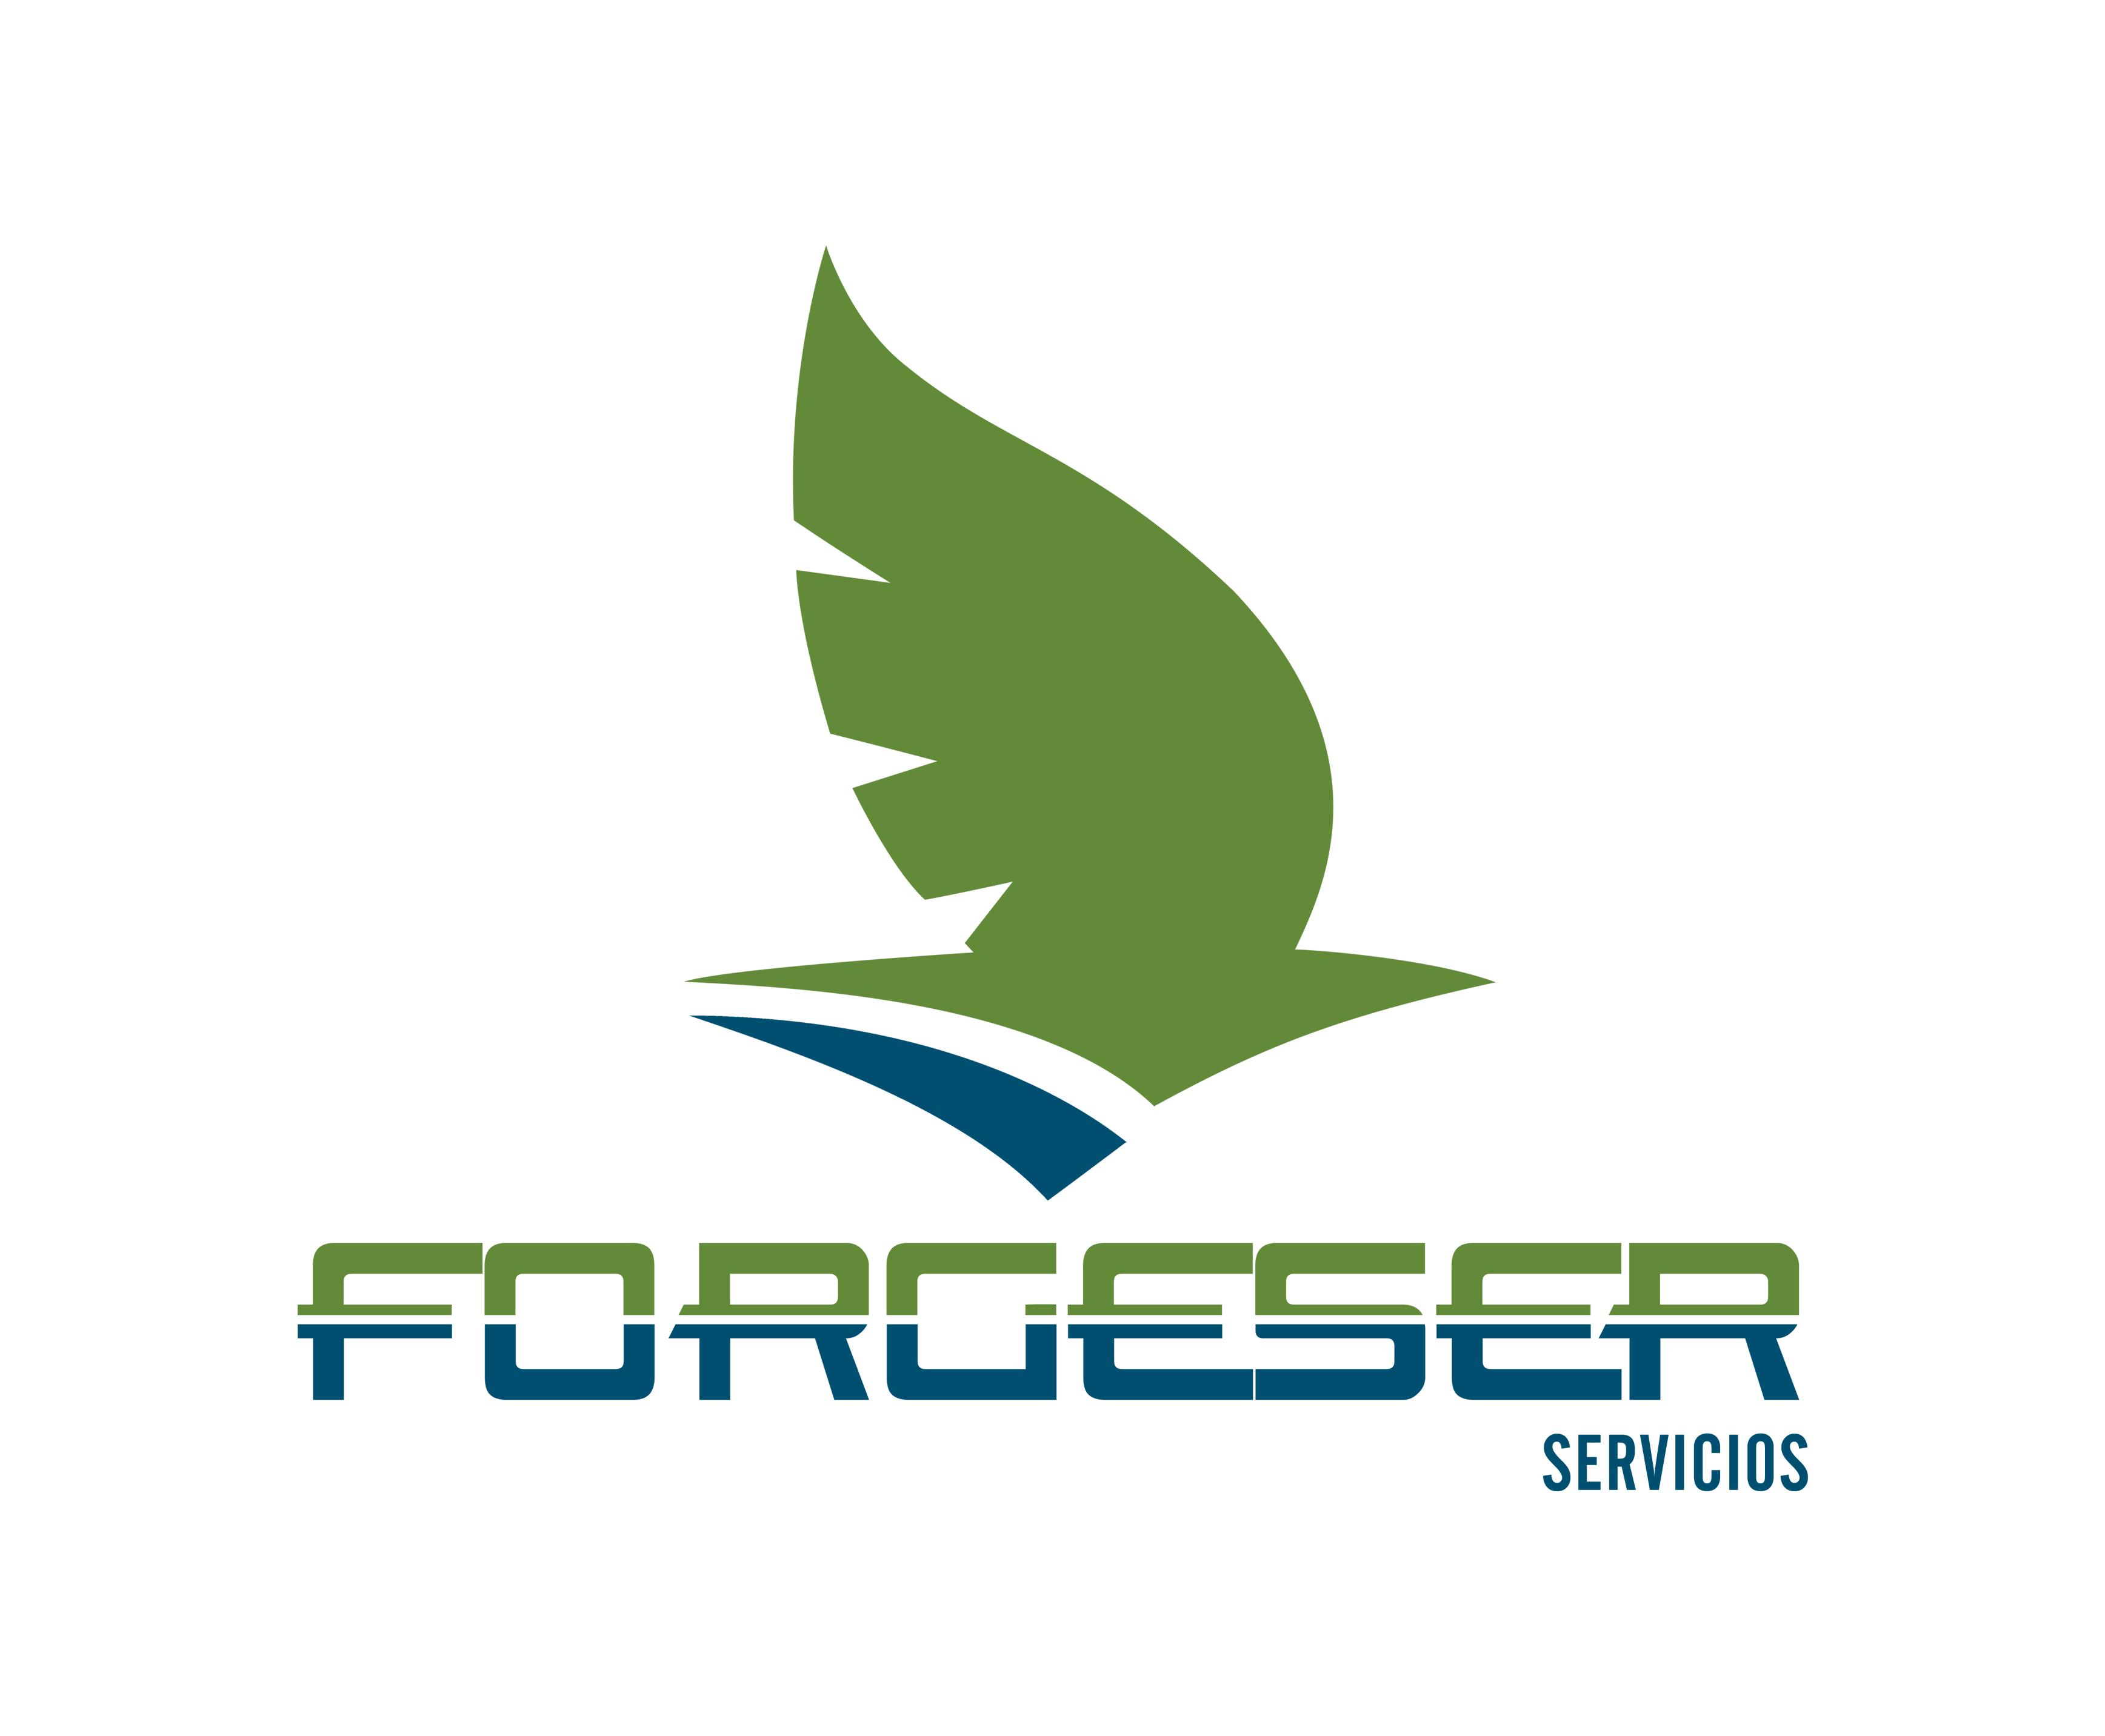 Forgeser servicios